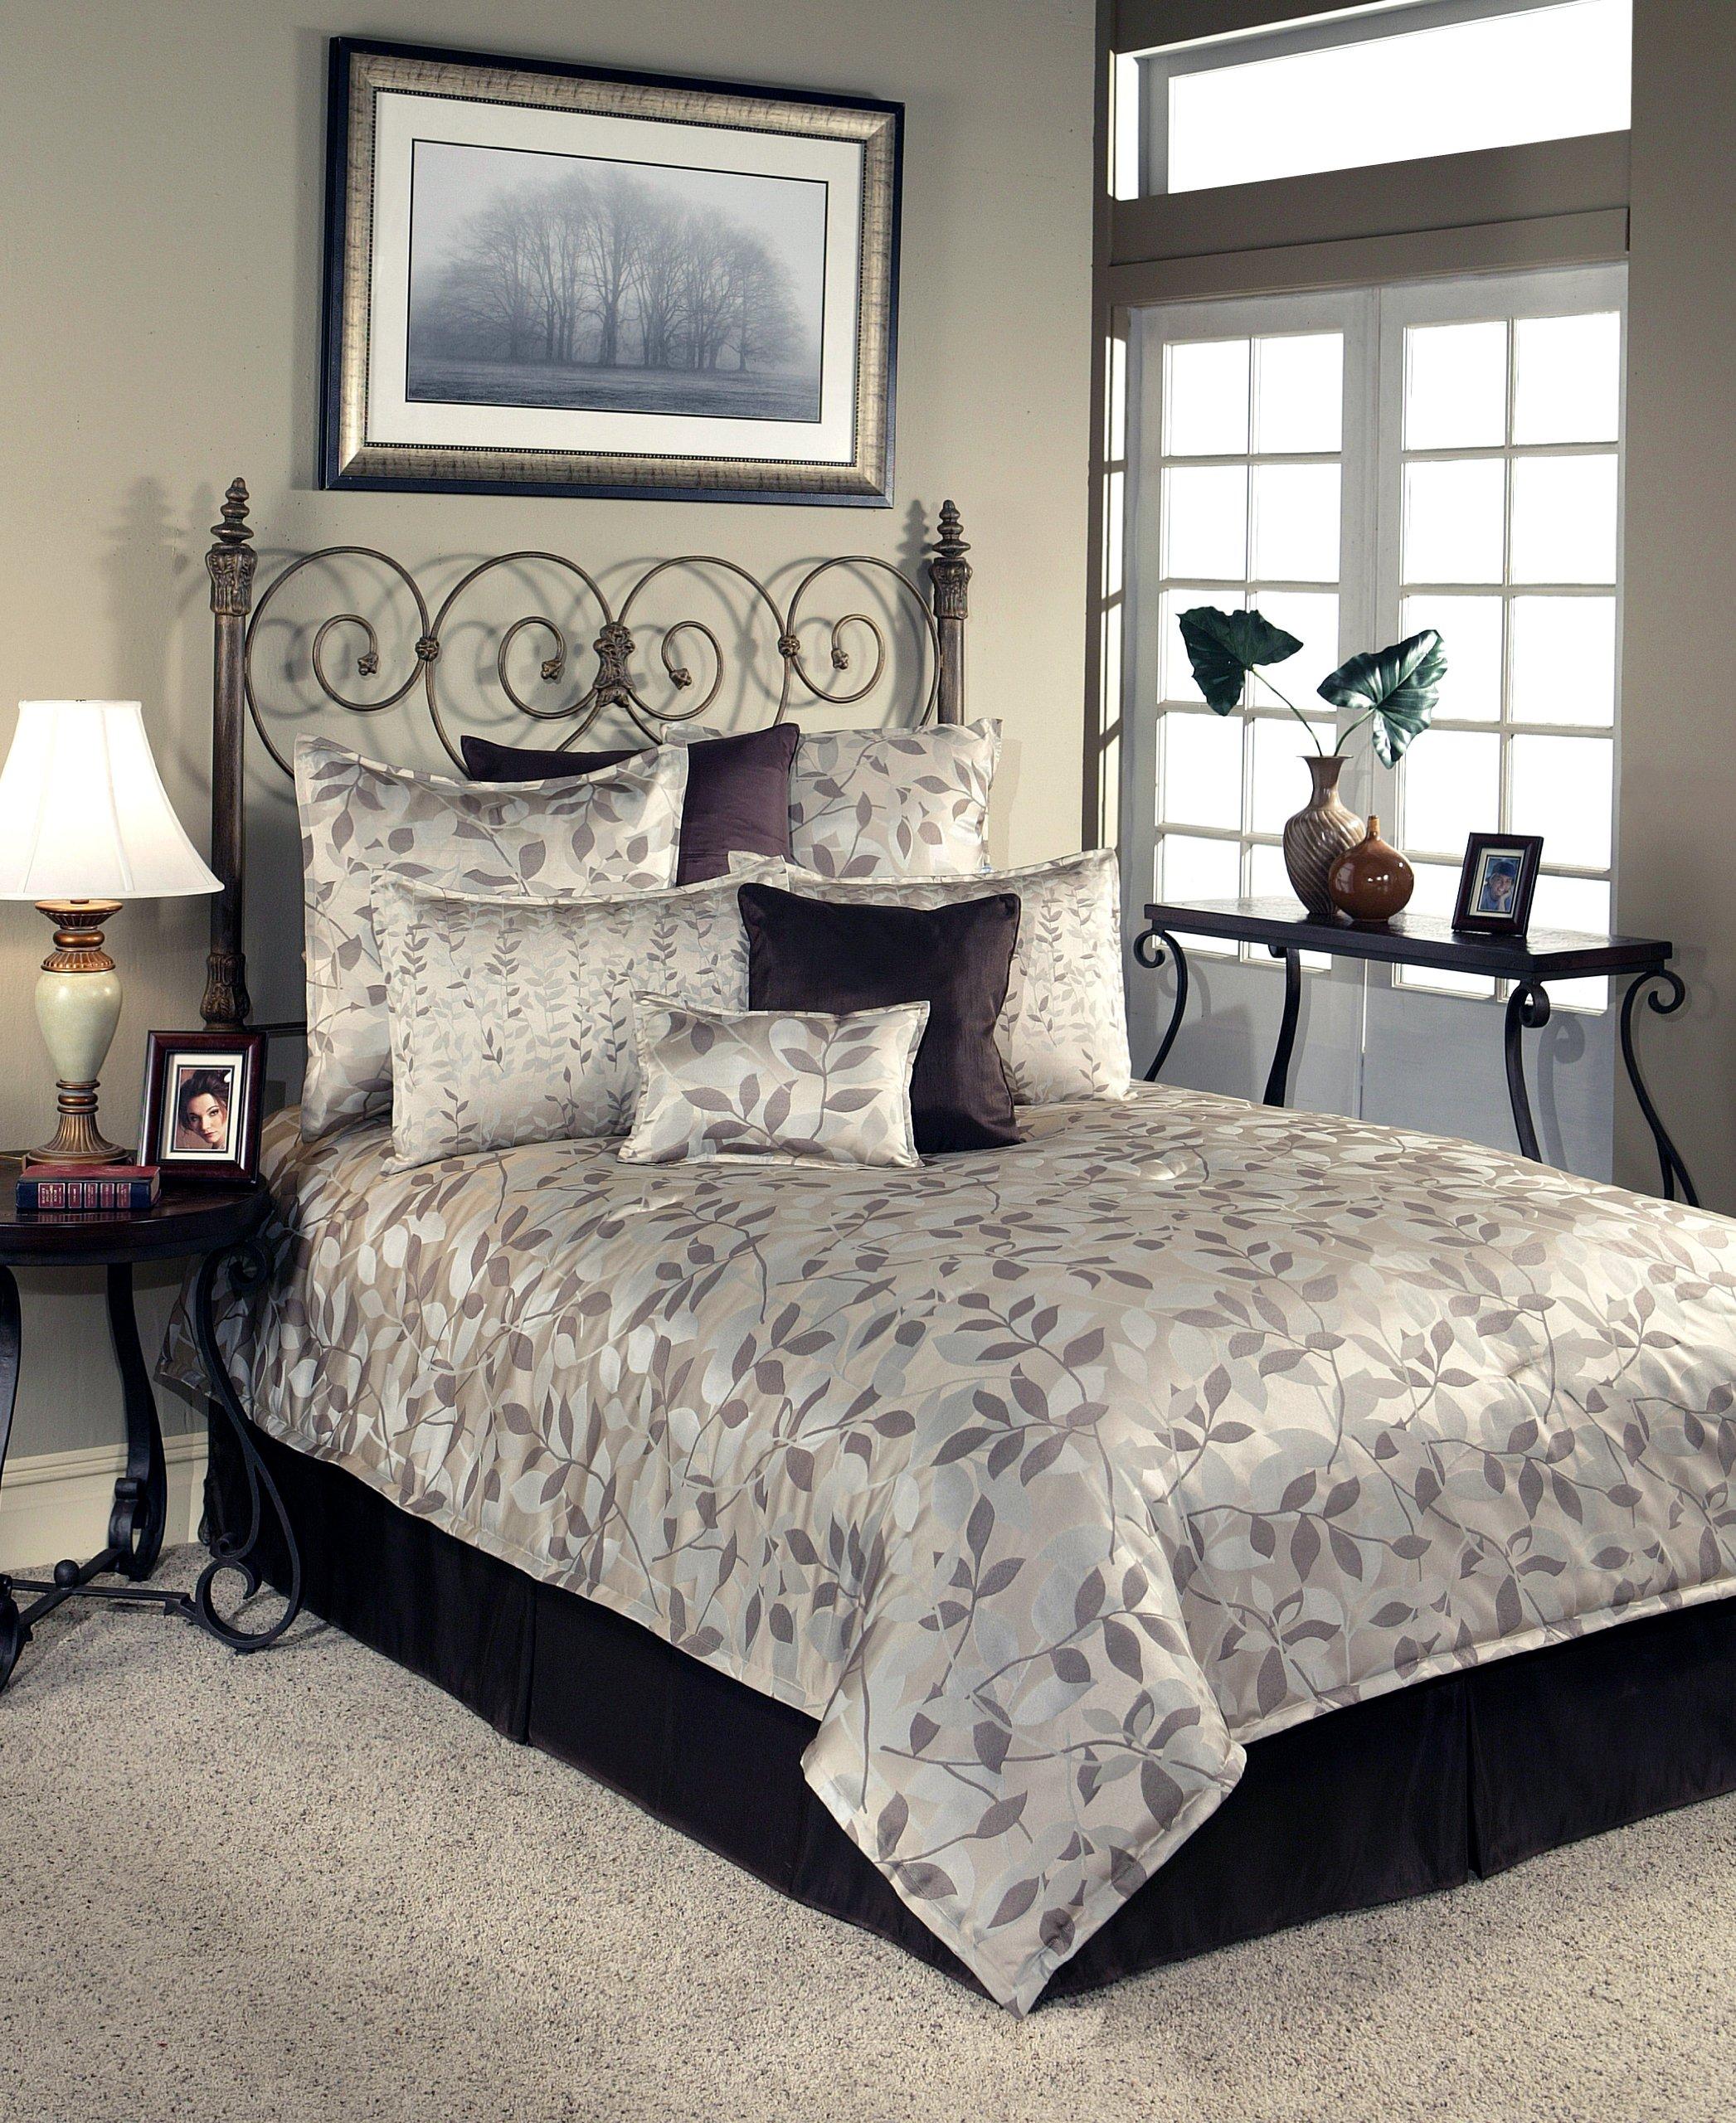 Sherry Kline Harmony Comforter Set, Queen,Taupe, 8 Piece